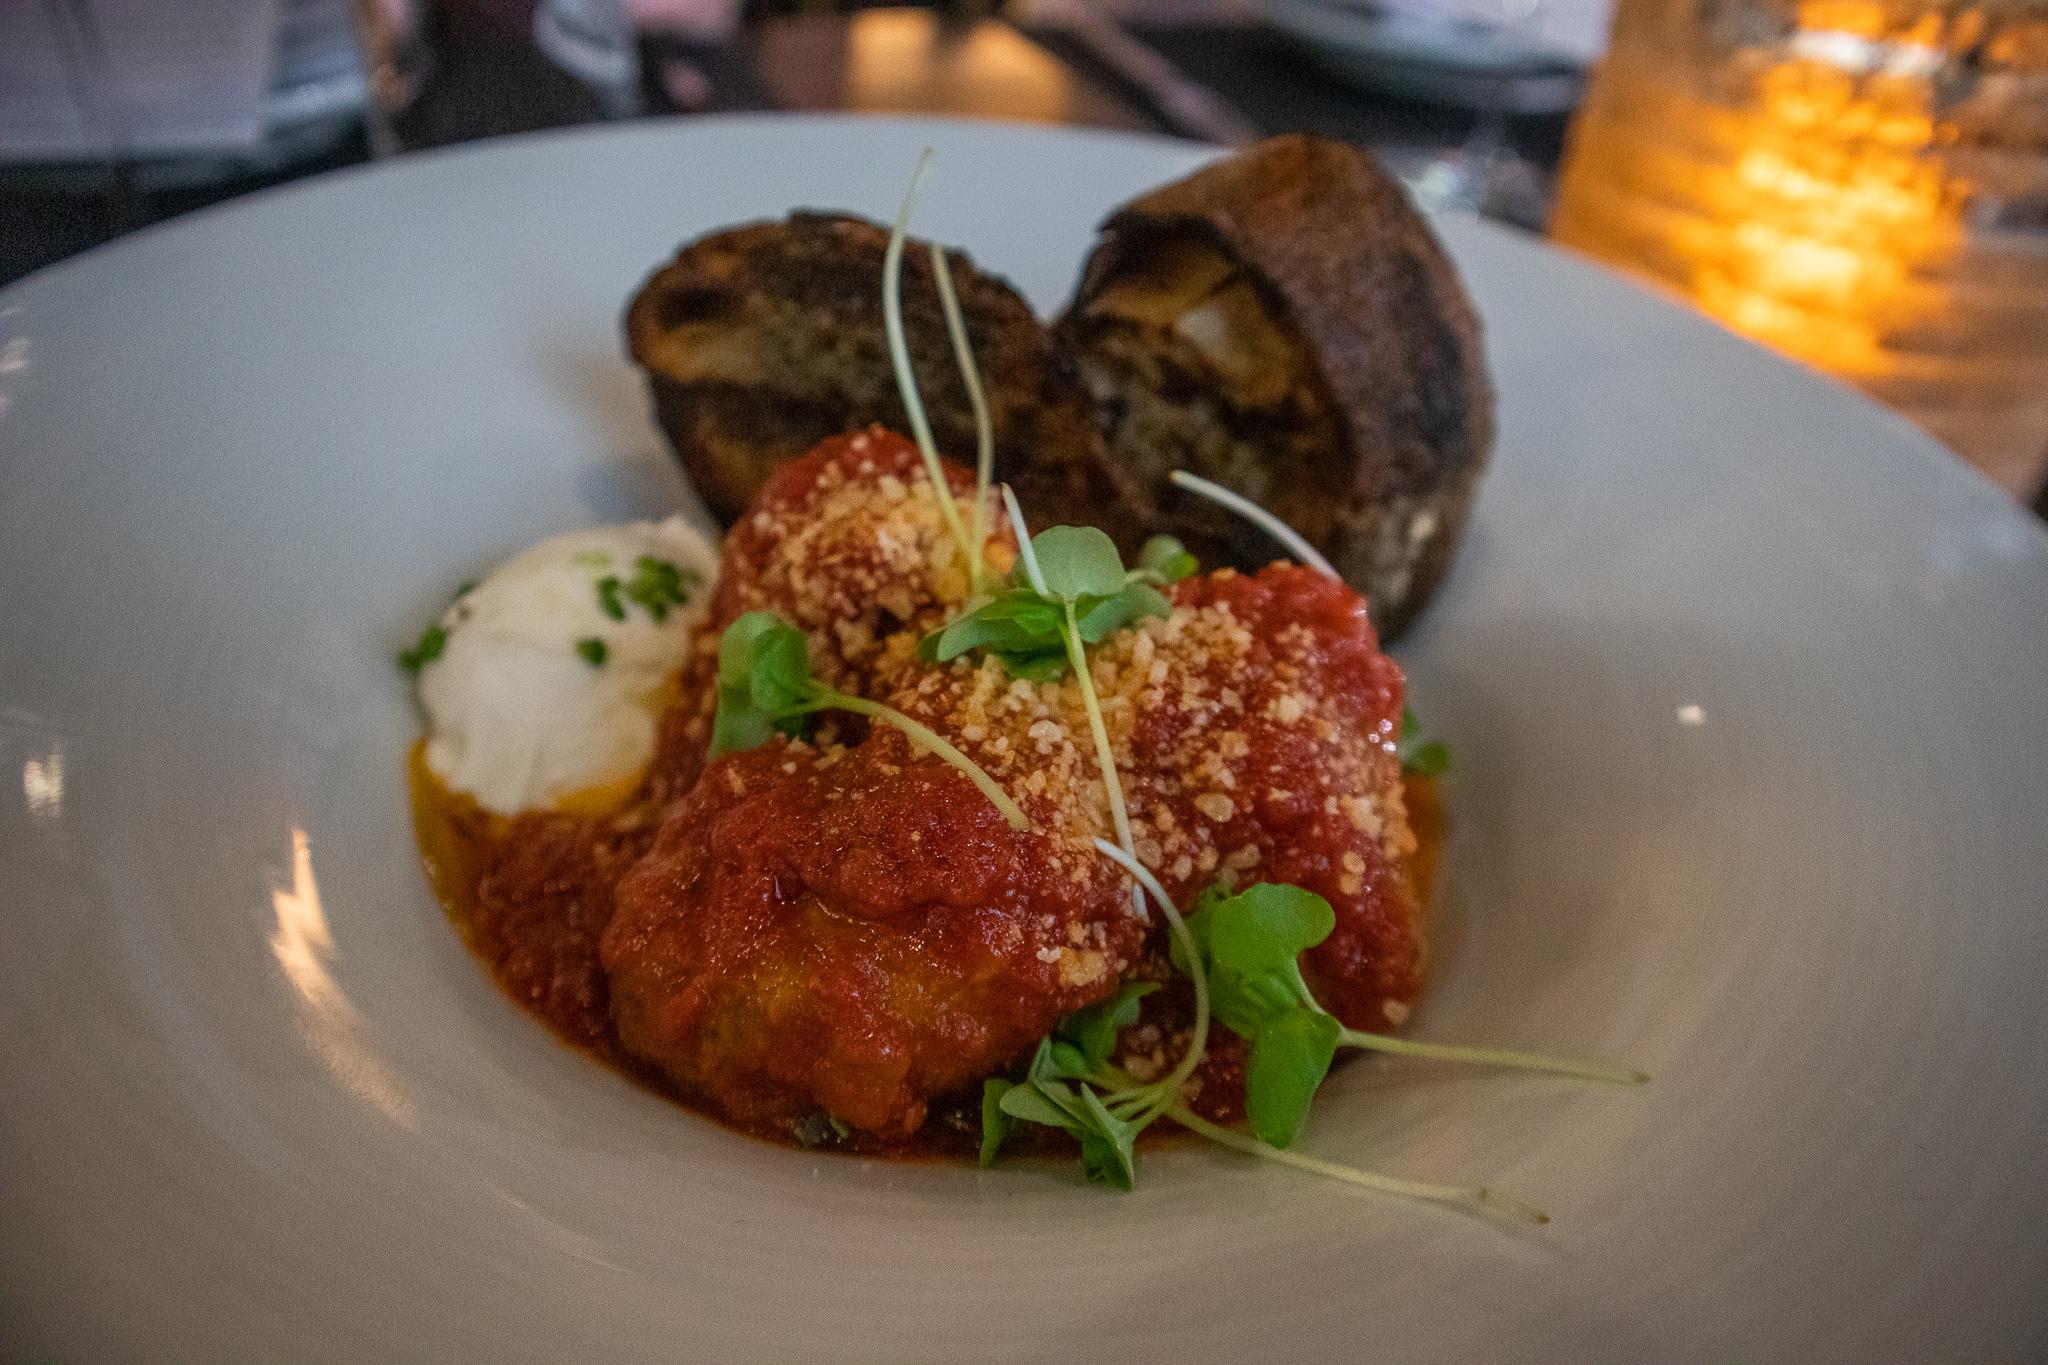 Rocco's Black Truffle Meatballs - Marinara Braised Meatballs, Black Truffle, Ricotta, Garlic Toast, Parmesan, Olive Oil